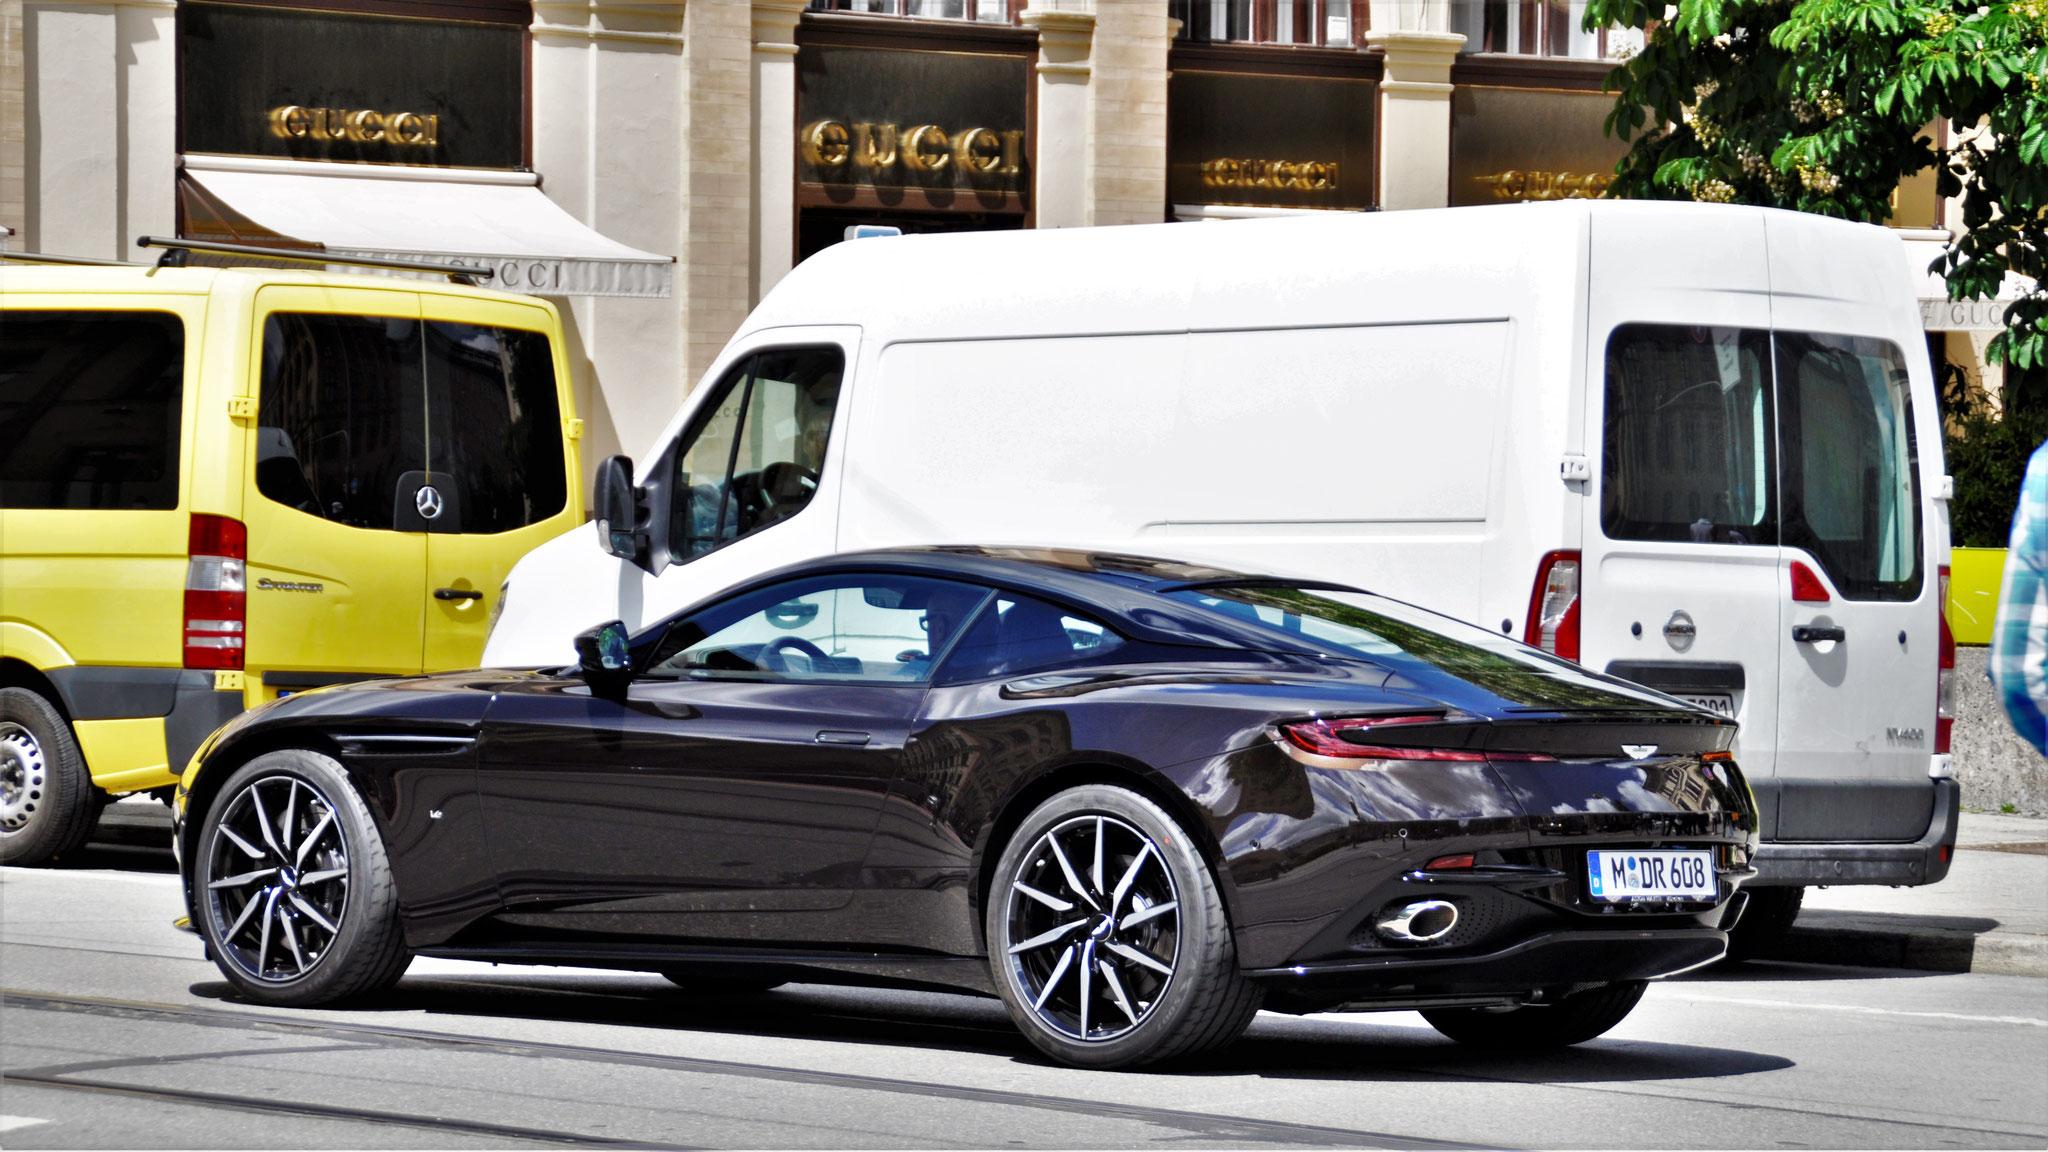 Aston Martin DB11 - M-DR-608